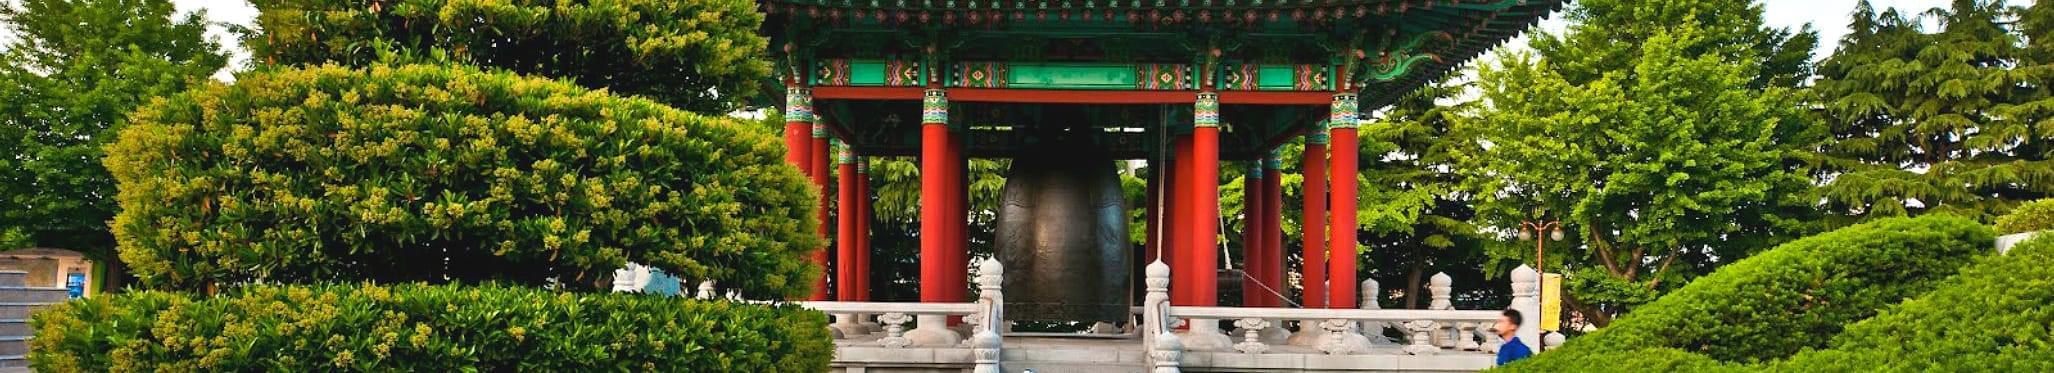 Магия востока:<br>Сеул, Пусан, Кёнджу, Сеул